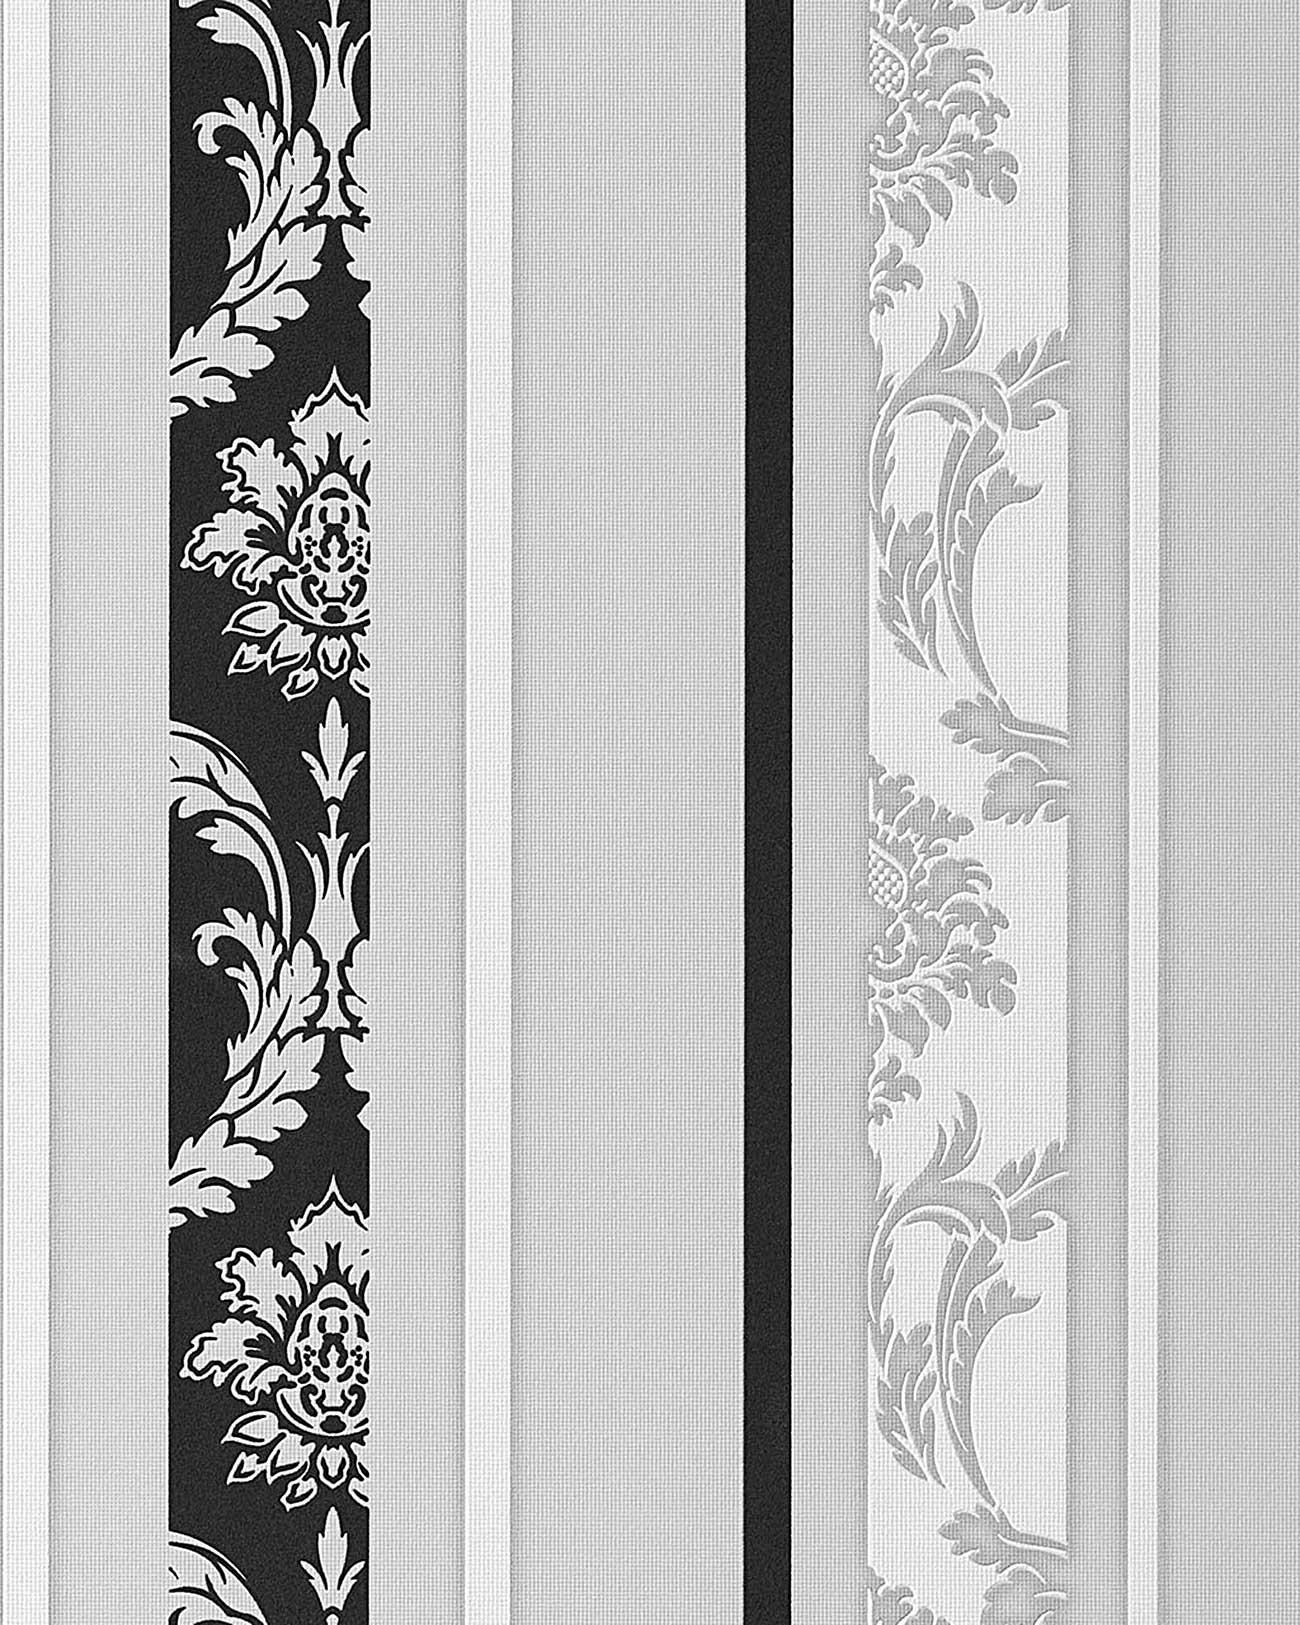 edem 053 20 streifen tapete barock damask ornamente flockoptik schwarz wei grau ebay. Black Bedroom Furniture Sets. Home Design Ideas